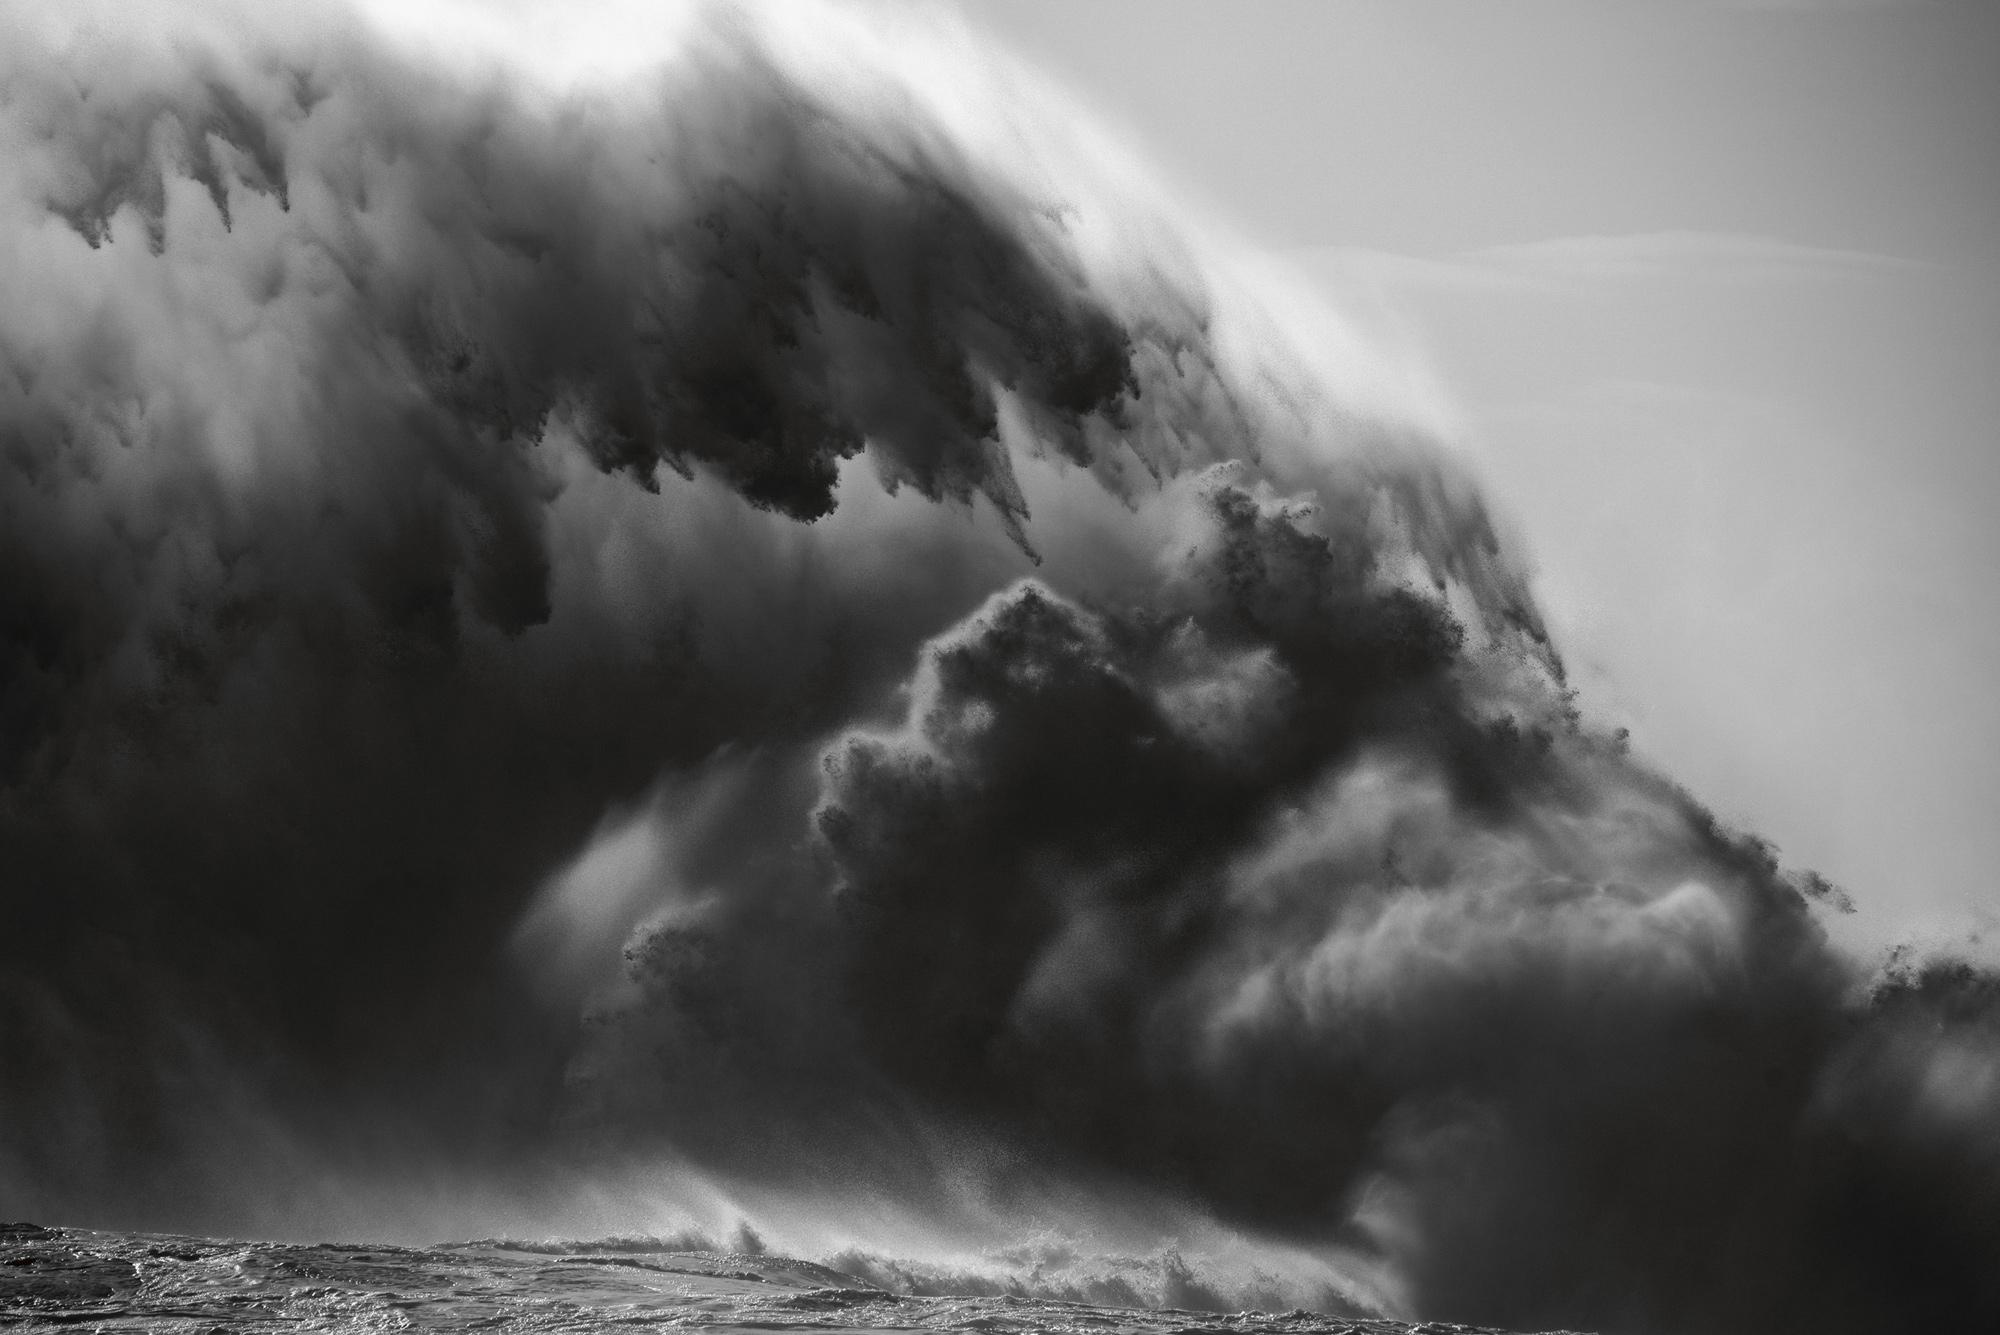 Alter-View Photography Showcase Photography Showcase Luke Shadbolt5.jpg